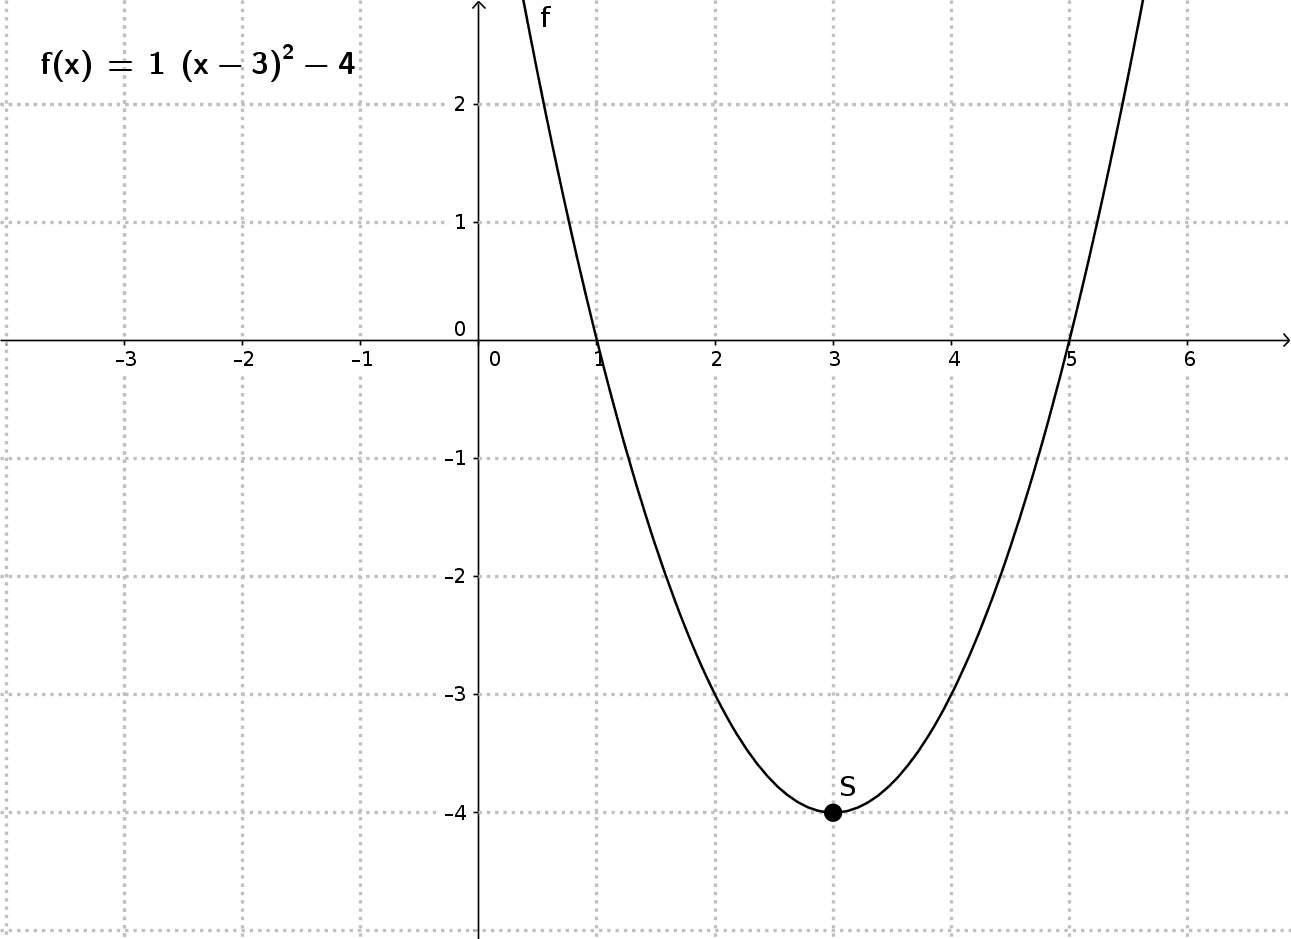 normalparabel-3r-4u